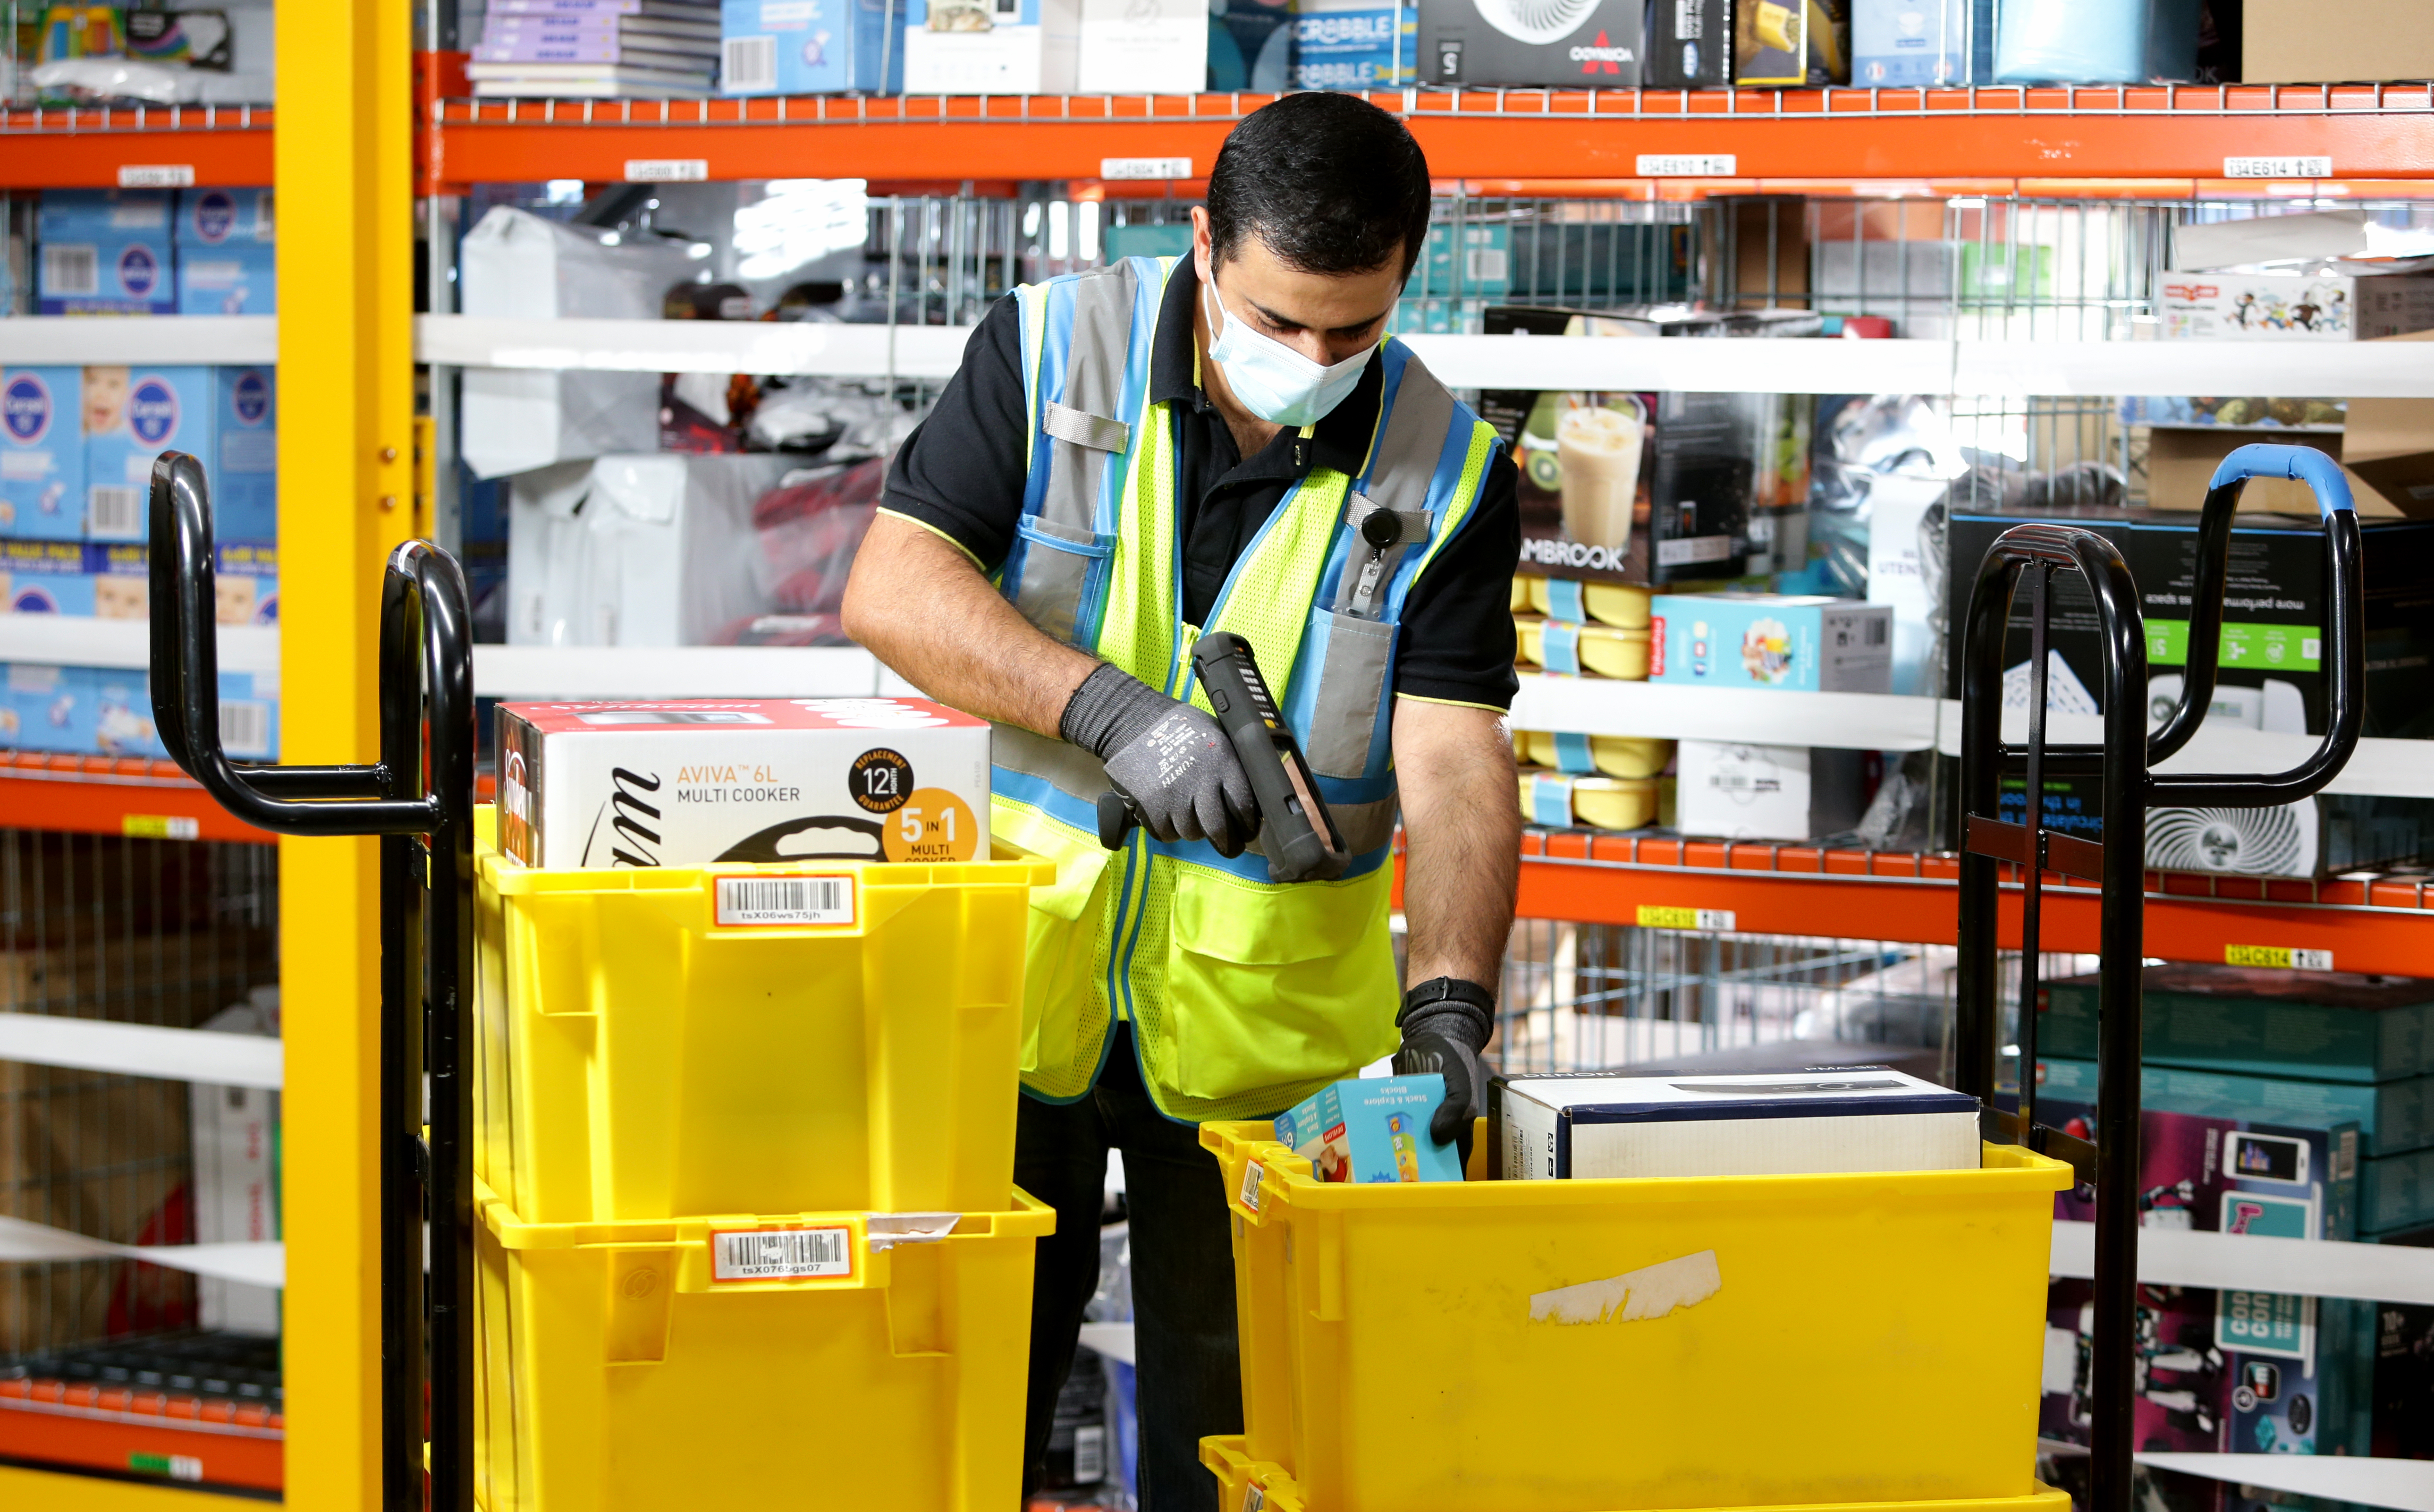 Amazon Australia on hiring spree as Christmas rush looms